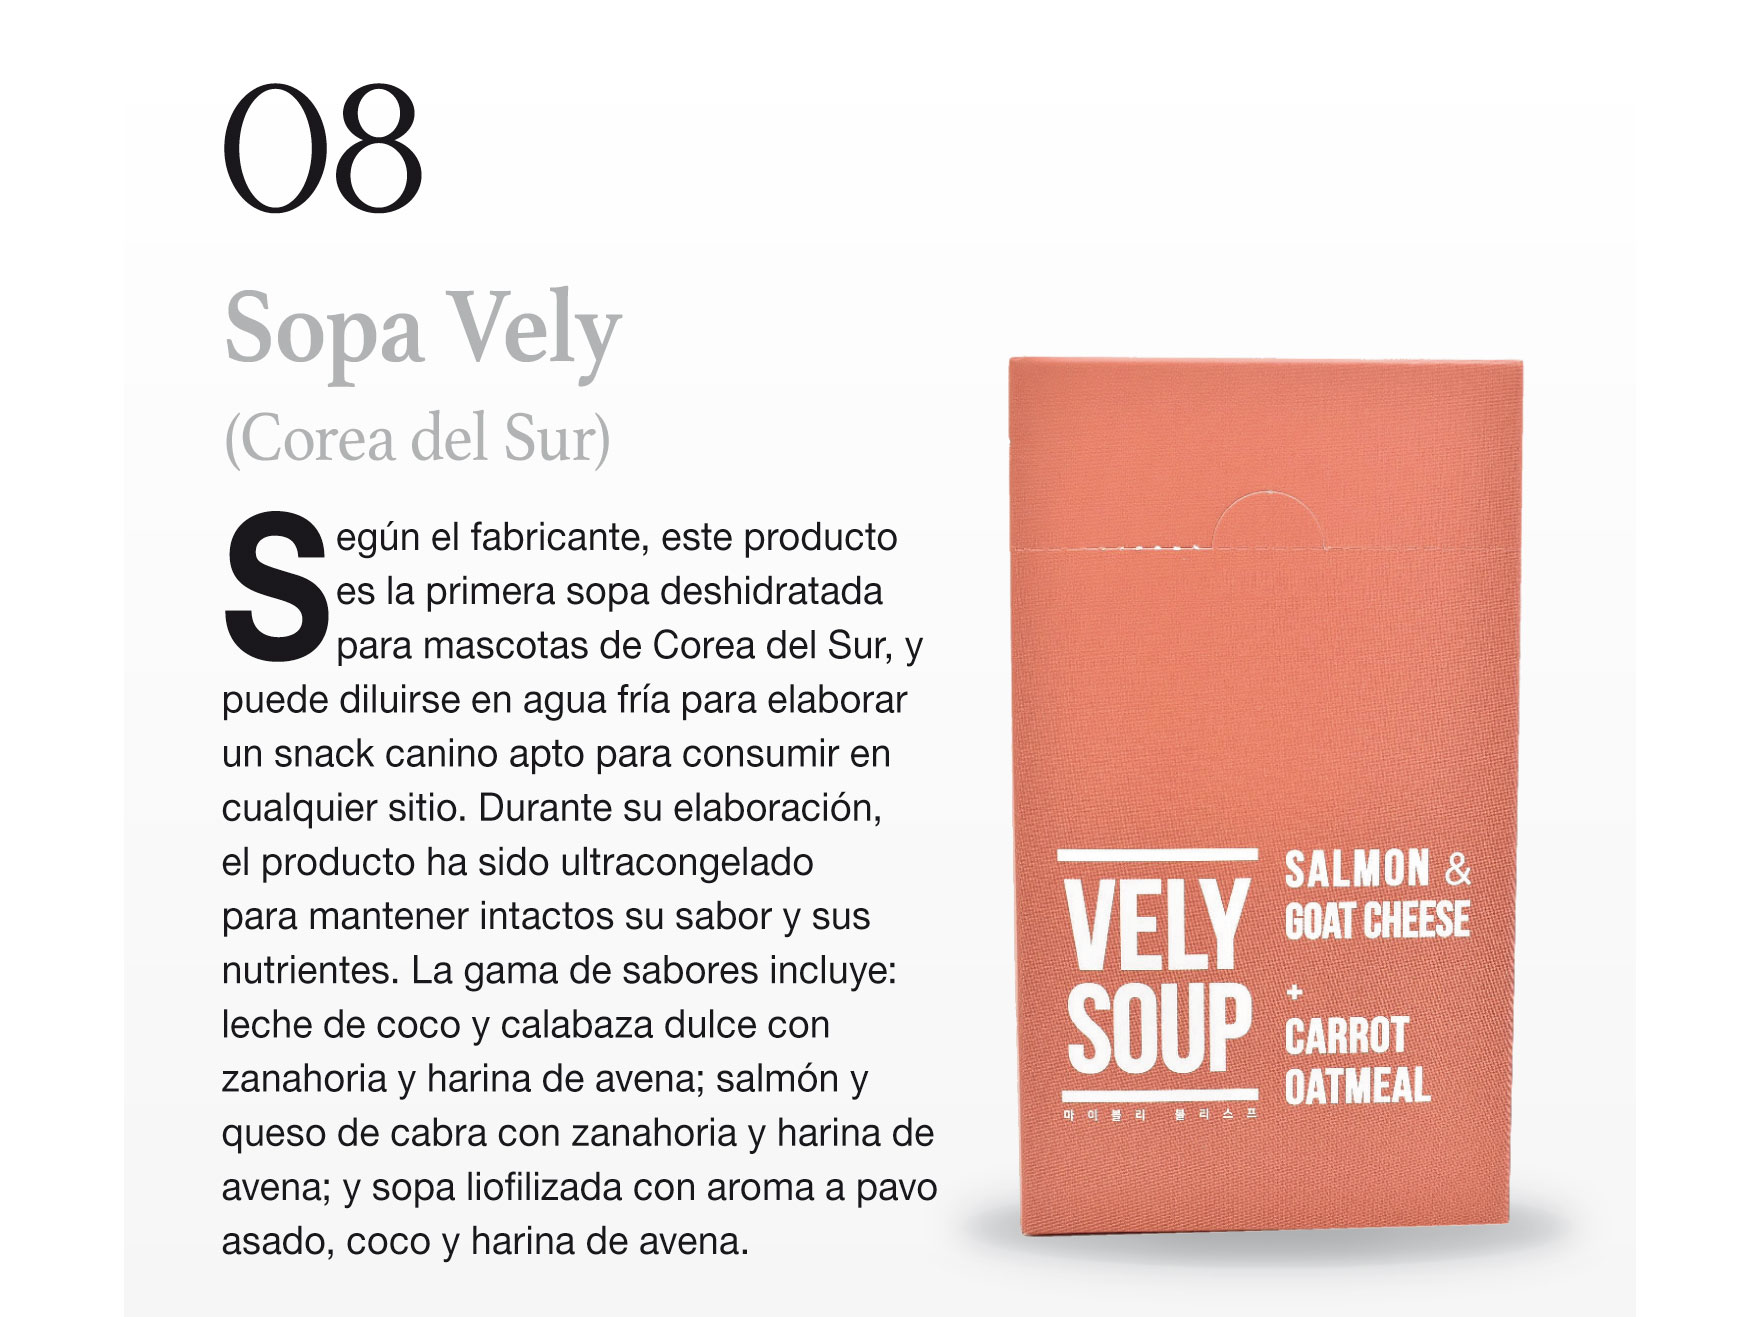 Sopa Vely (Corea del Sur)